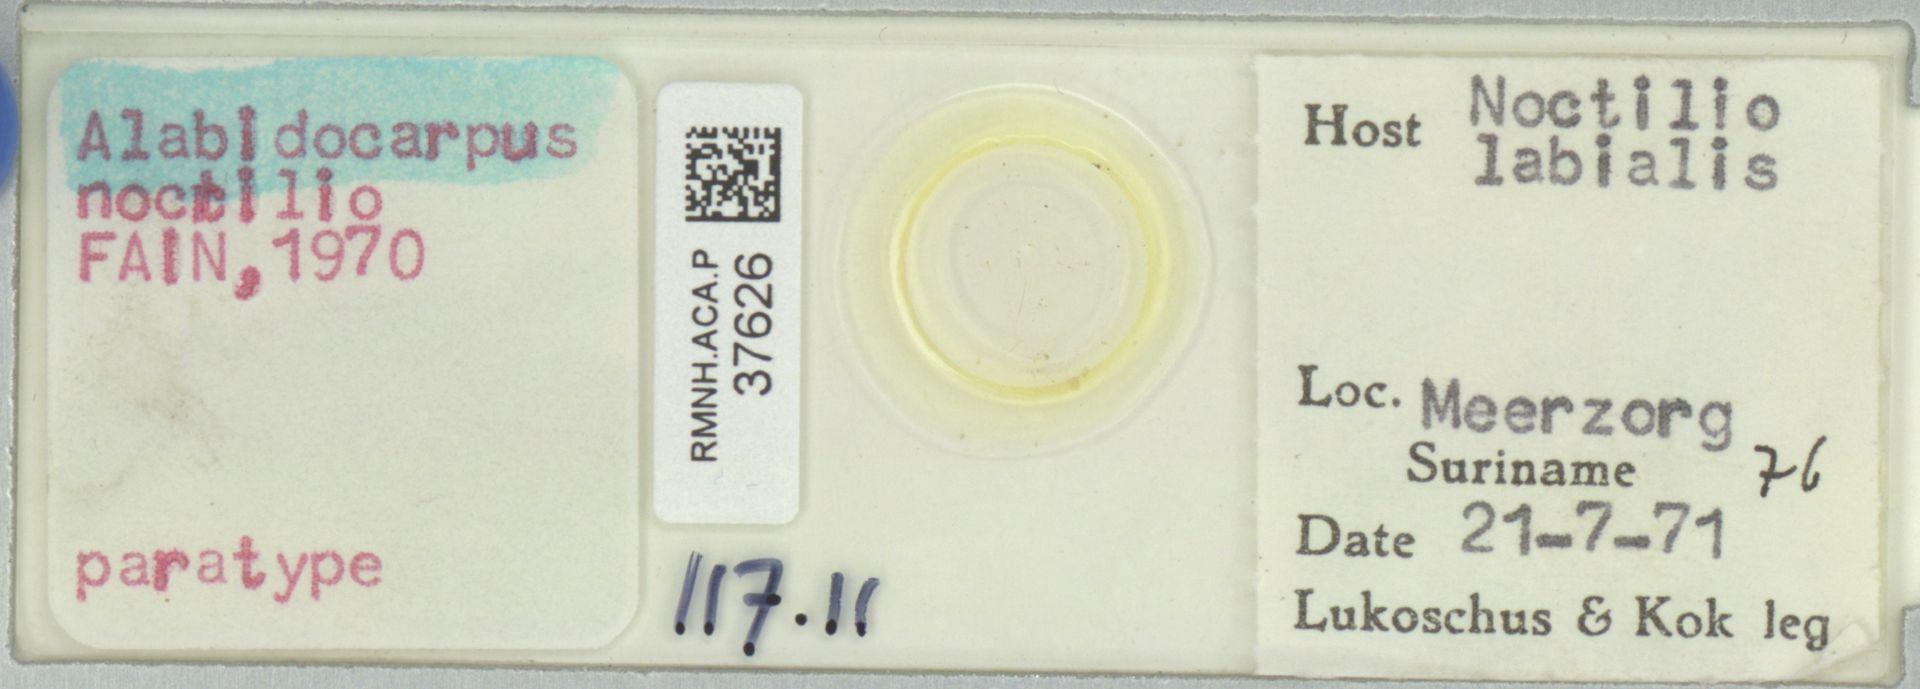 RMNH.ACA.P.37626 | Alabidocarpus nocilio Fain, 1970